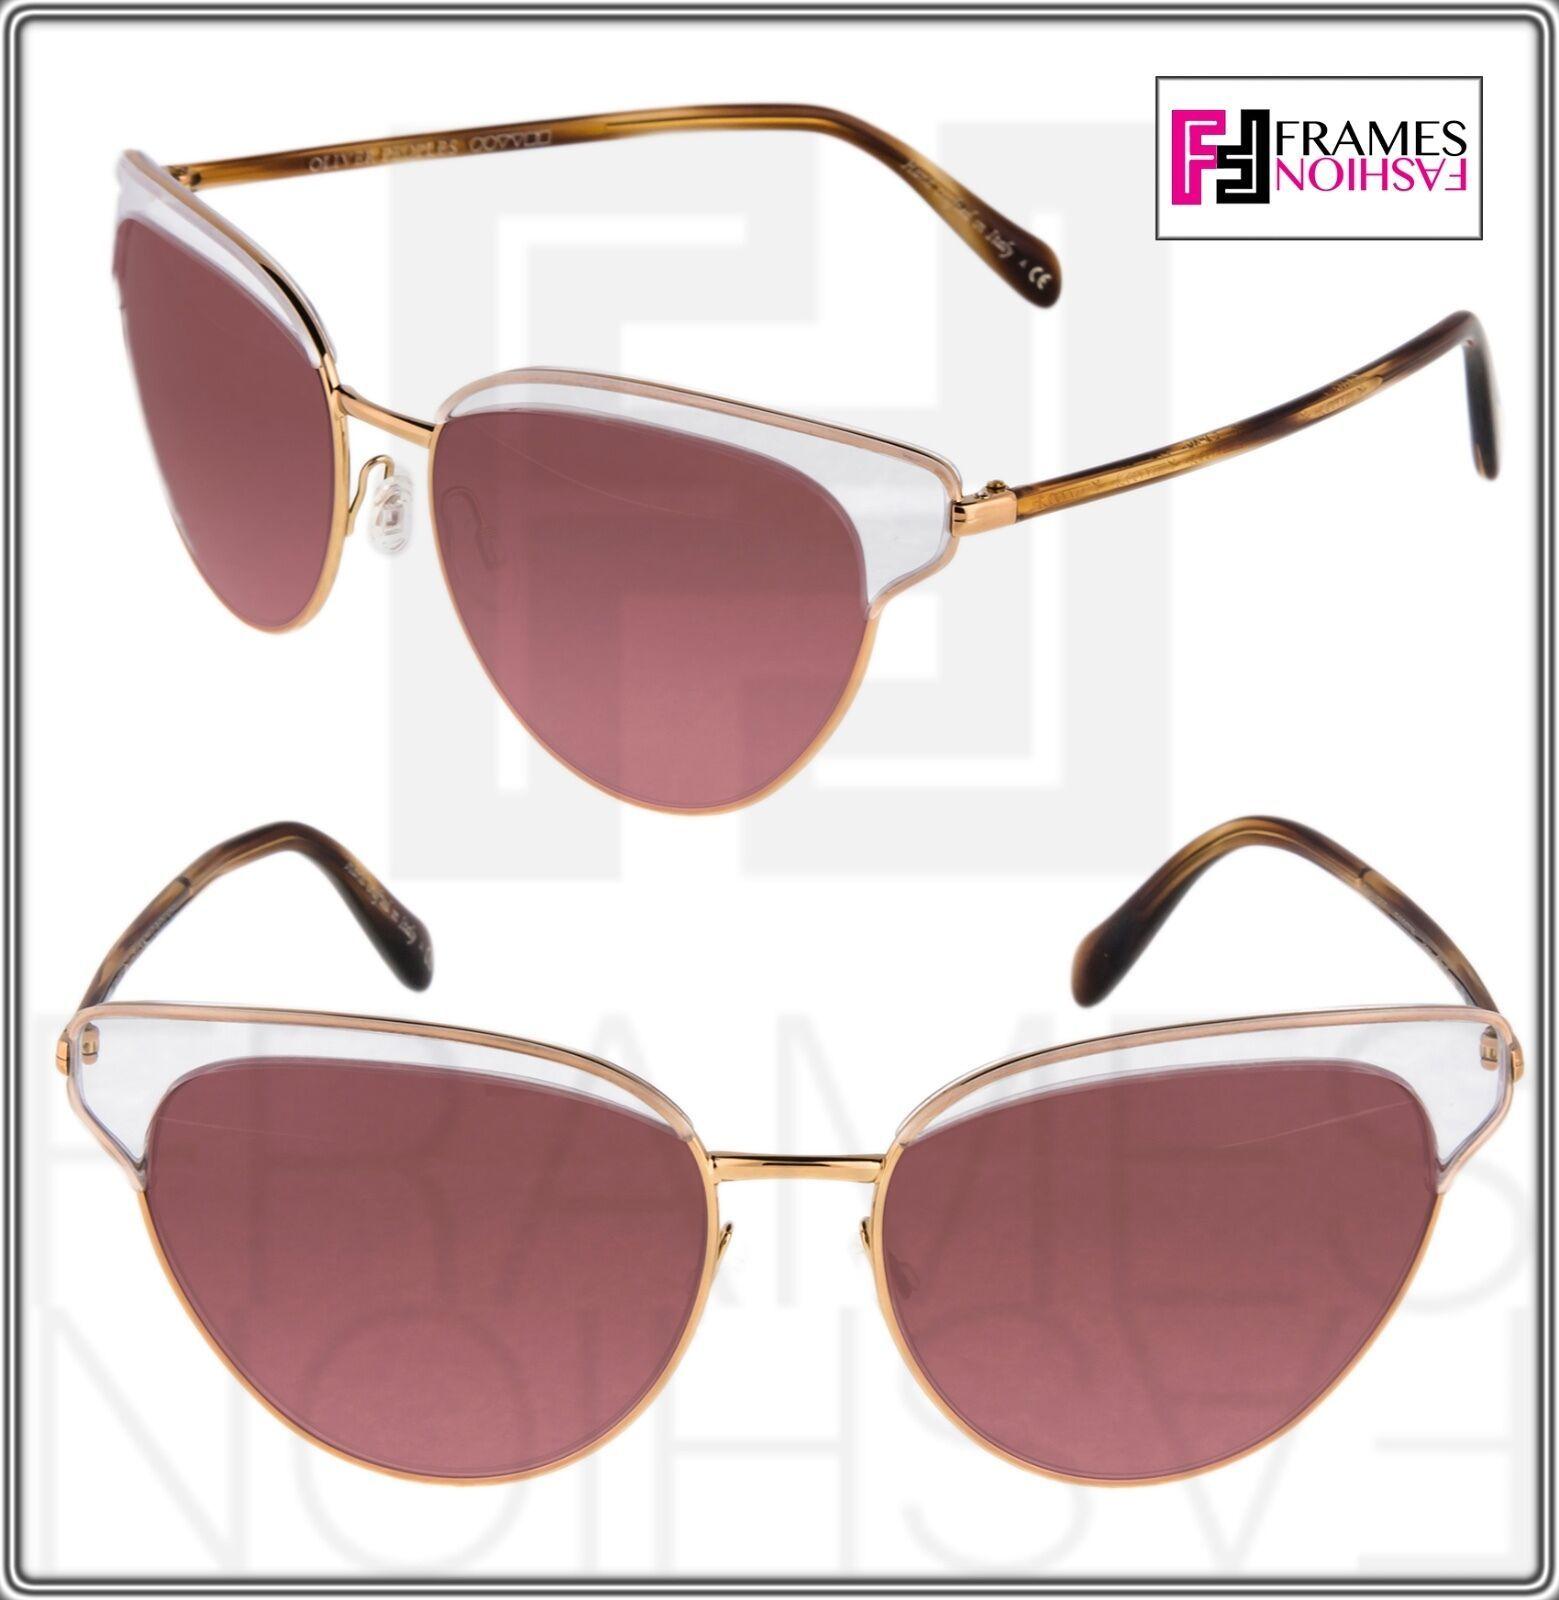 OLIVER PEOPLES JOSA OV1187S Rose Gold Pink Crystal Cat Eye Sunglasses 1187